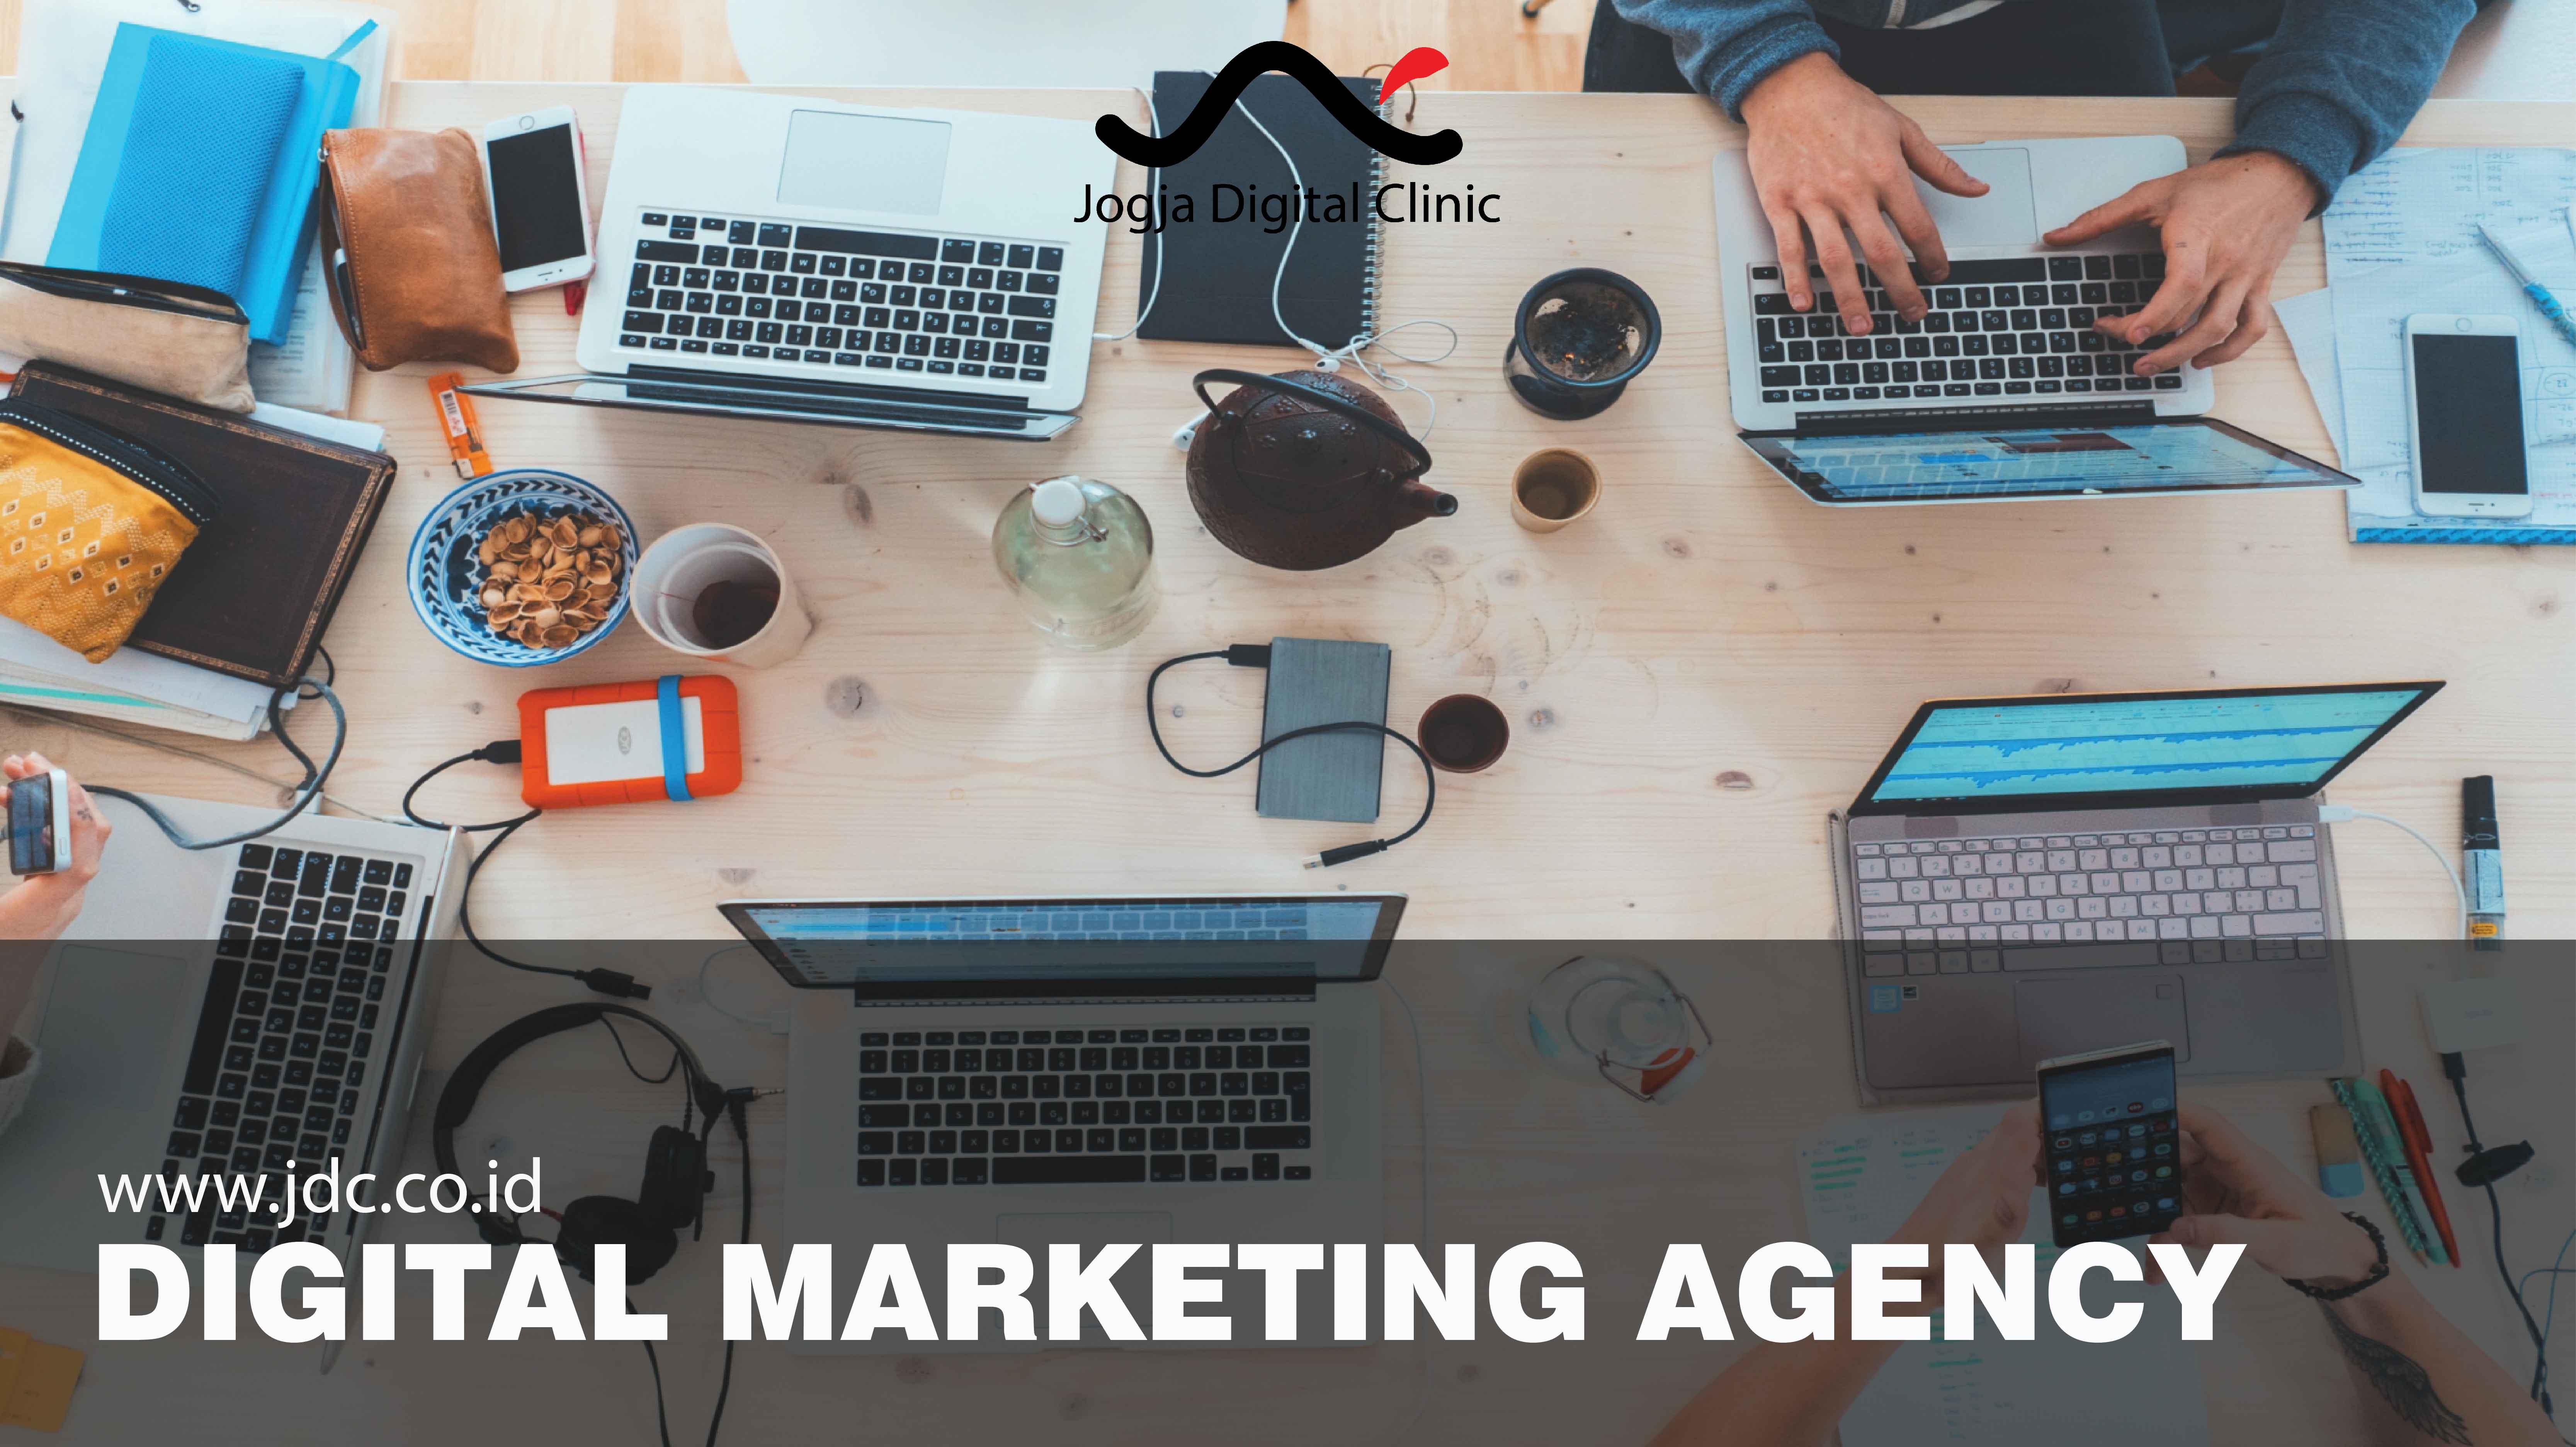 digital marketing agency jdc